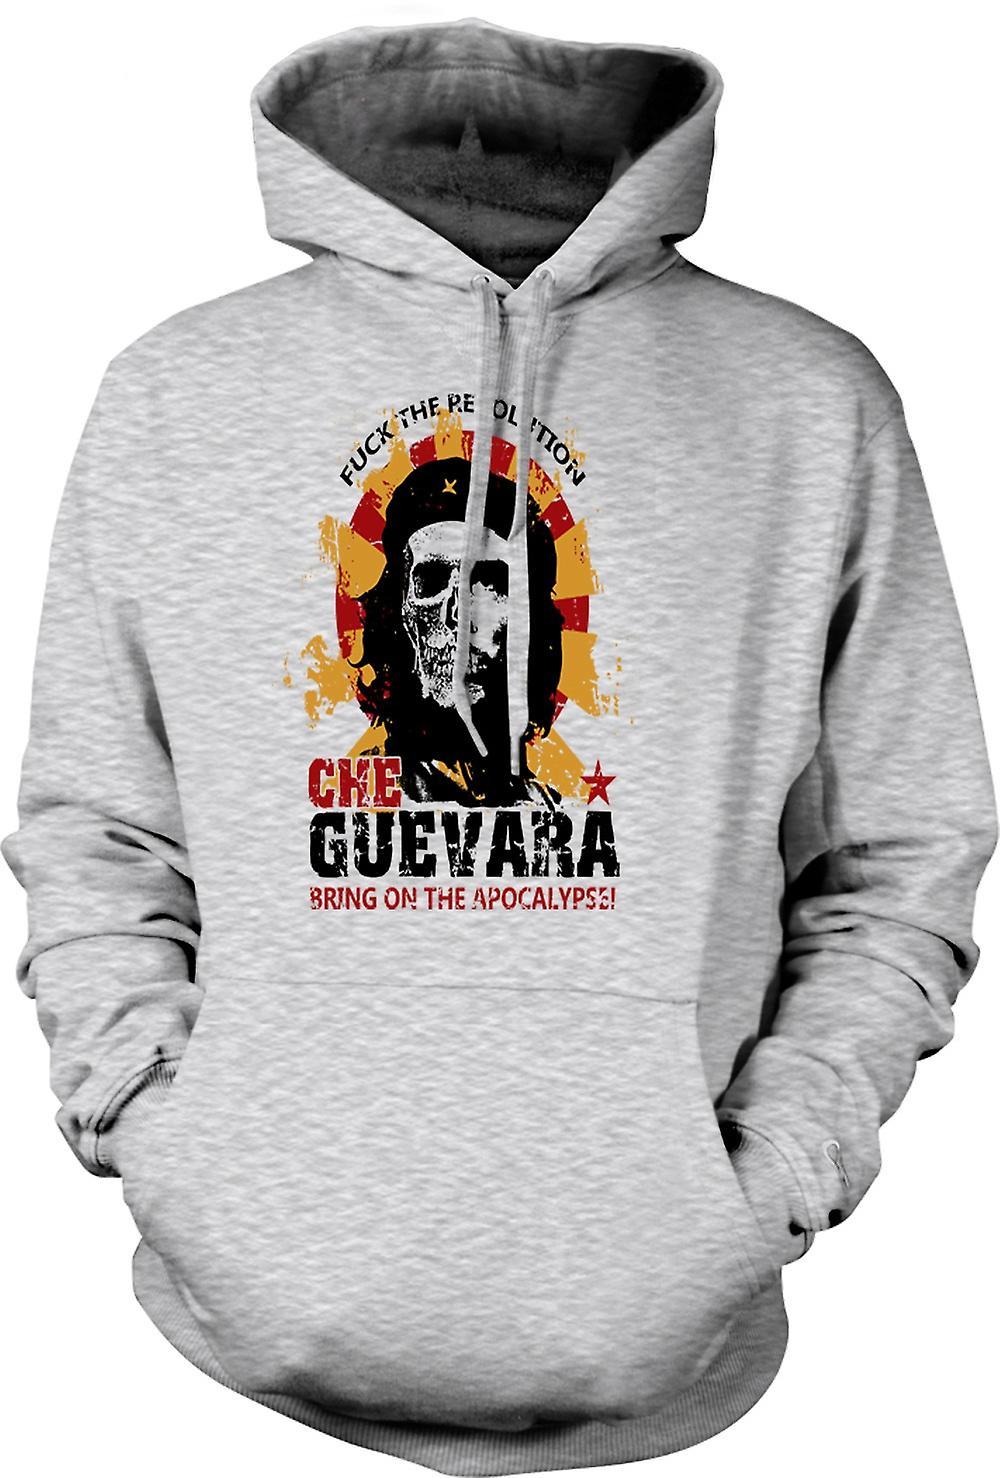 Mens Hoodie - Che Guevara - Apocalypse - Communism